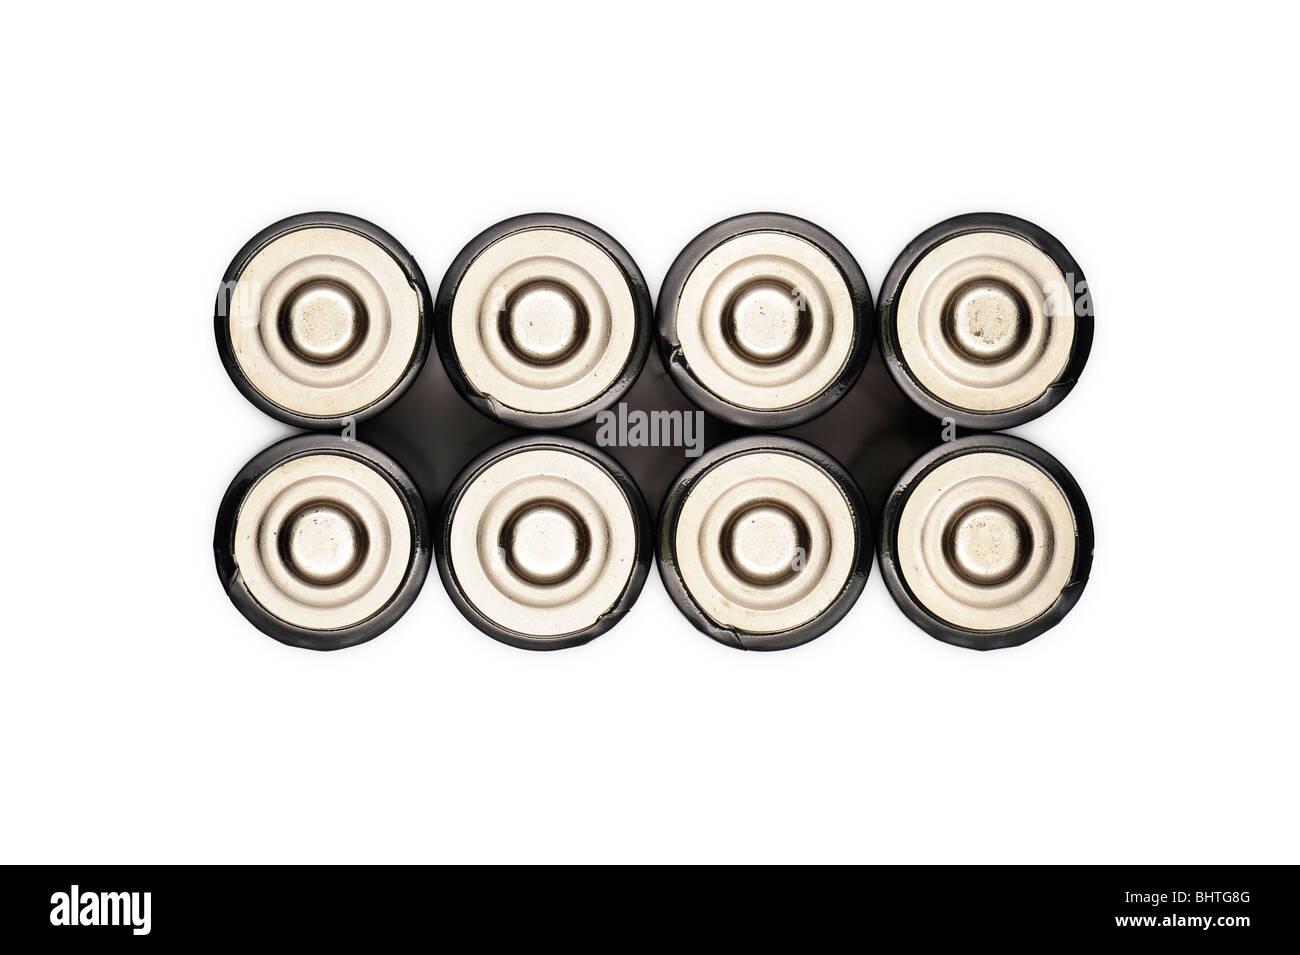 Eight batteries - Stock Image